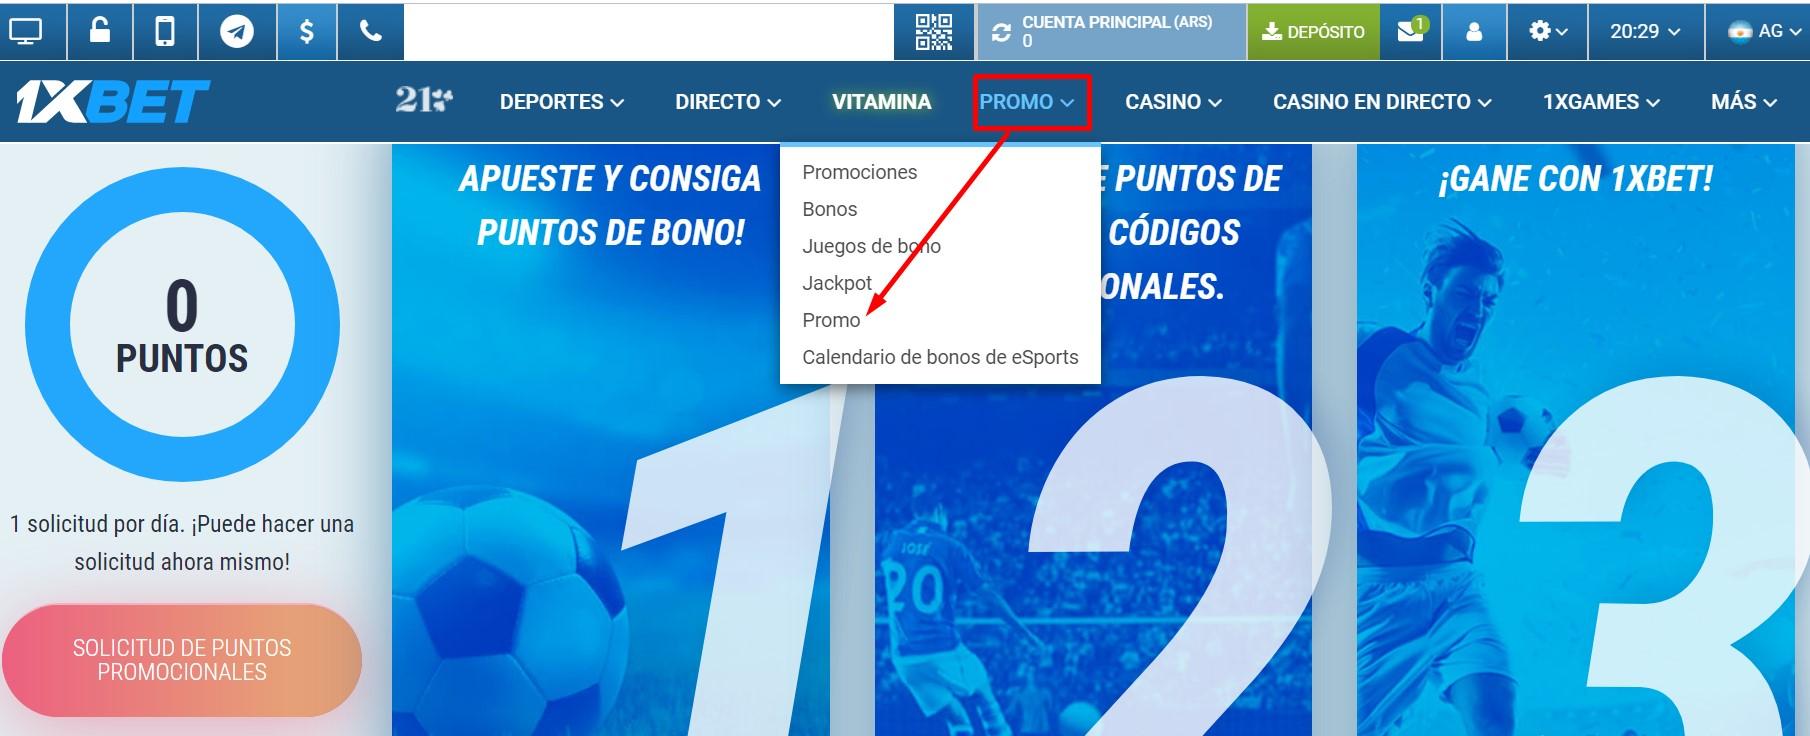 Code de promo 1xBet Argentina